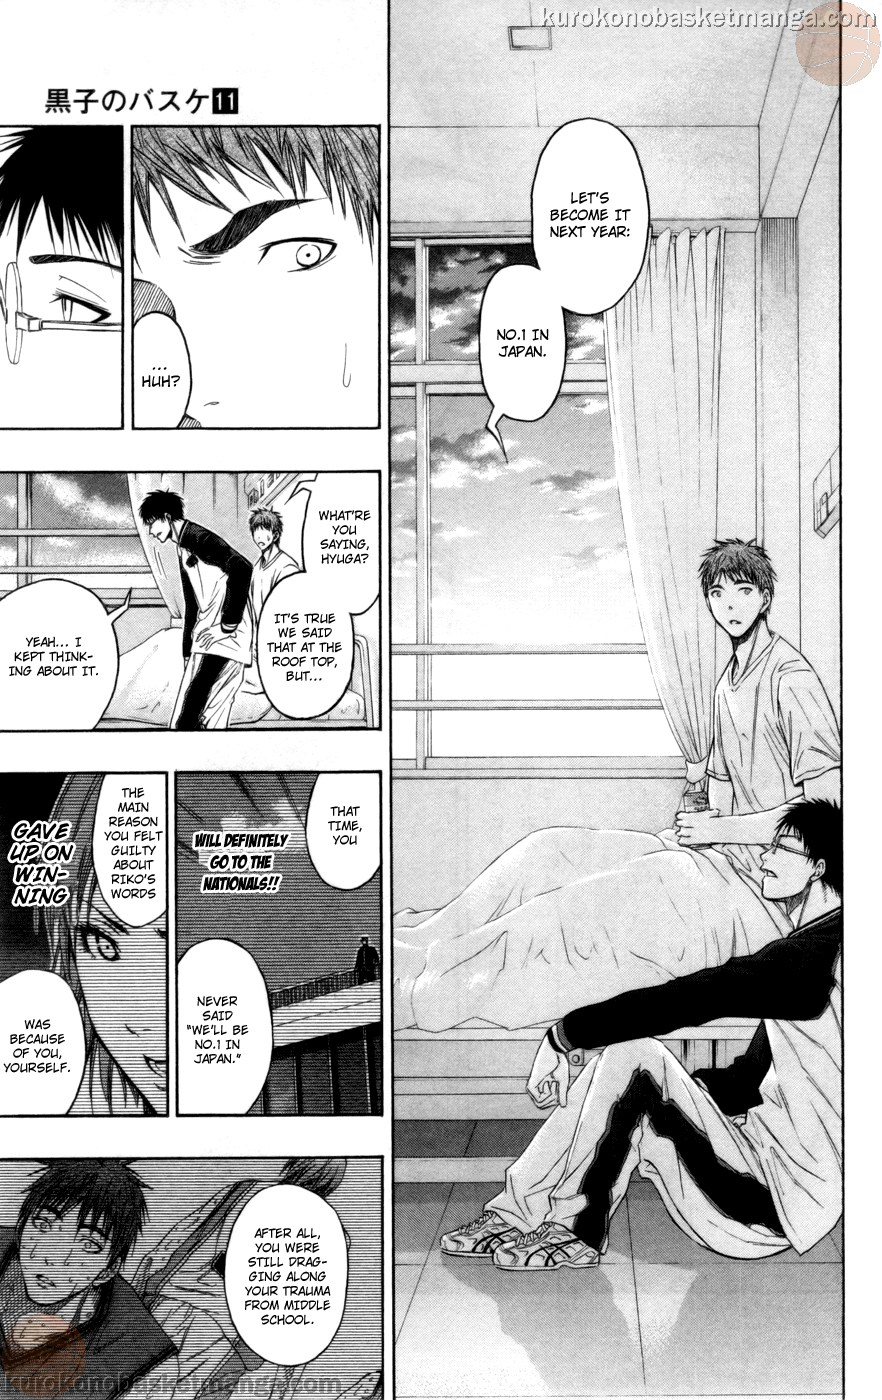 Kuroko no Basket Manga Chapter 99 - Image 18